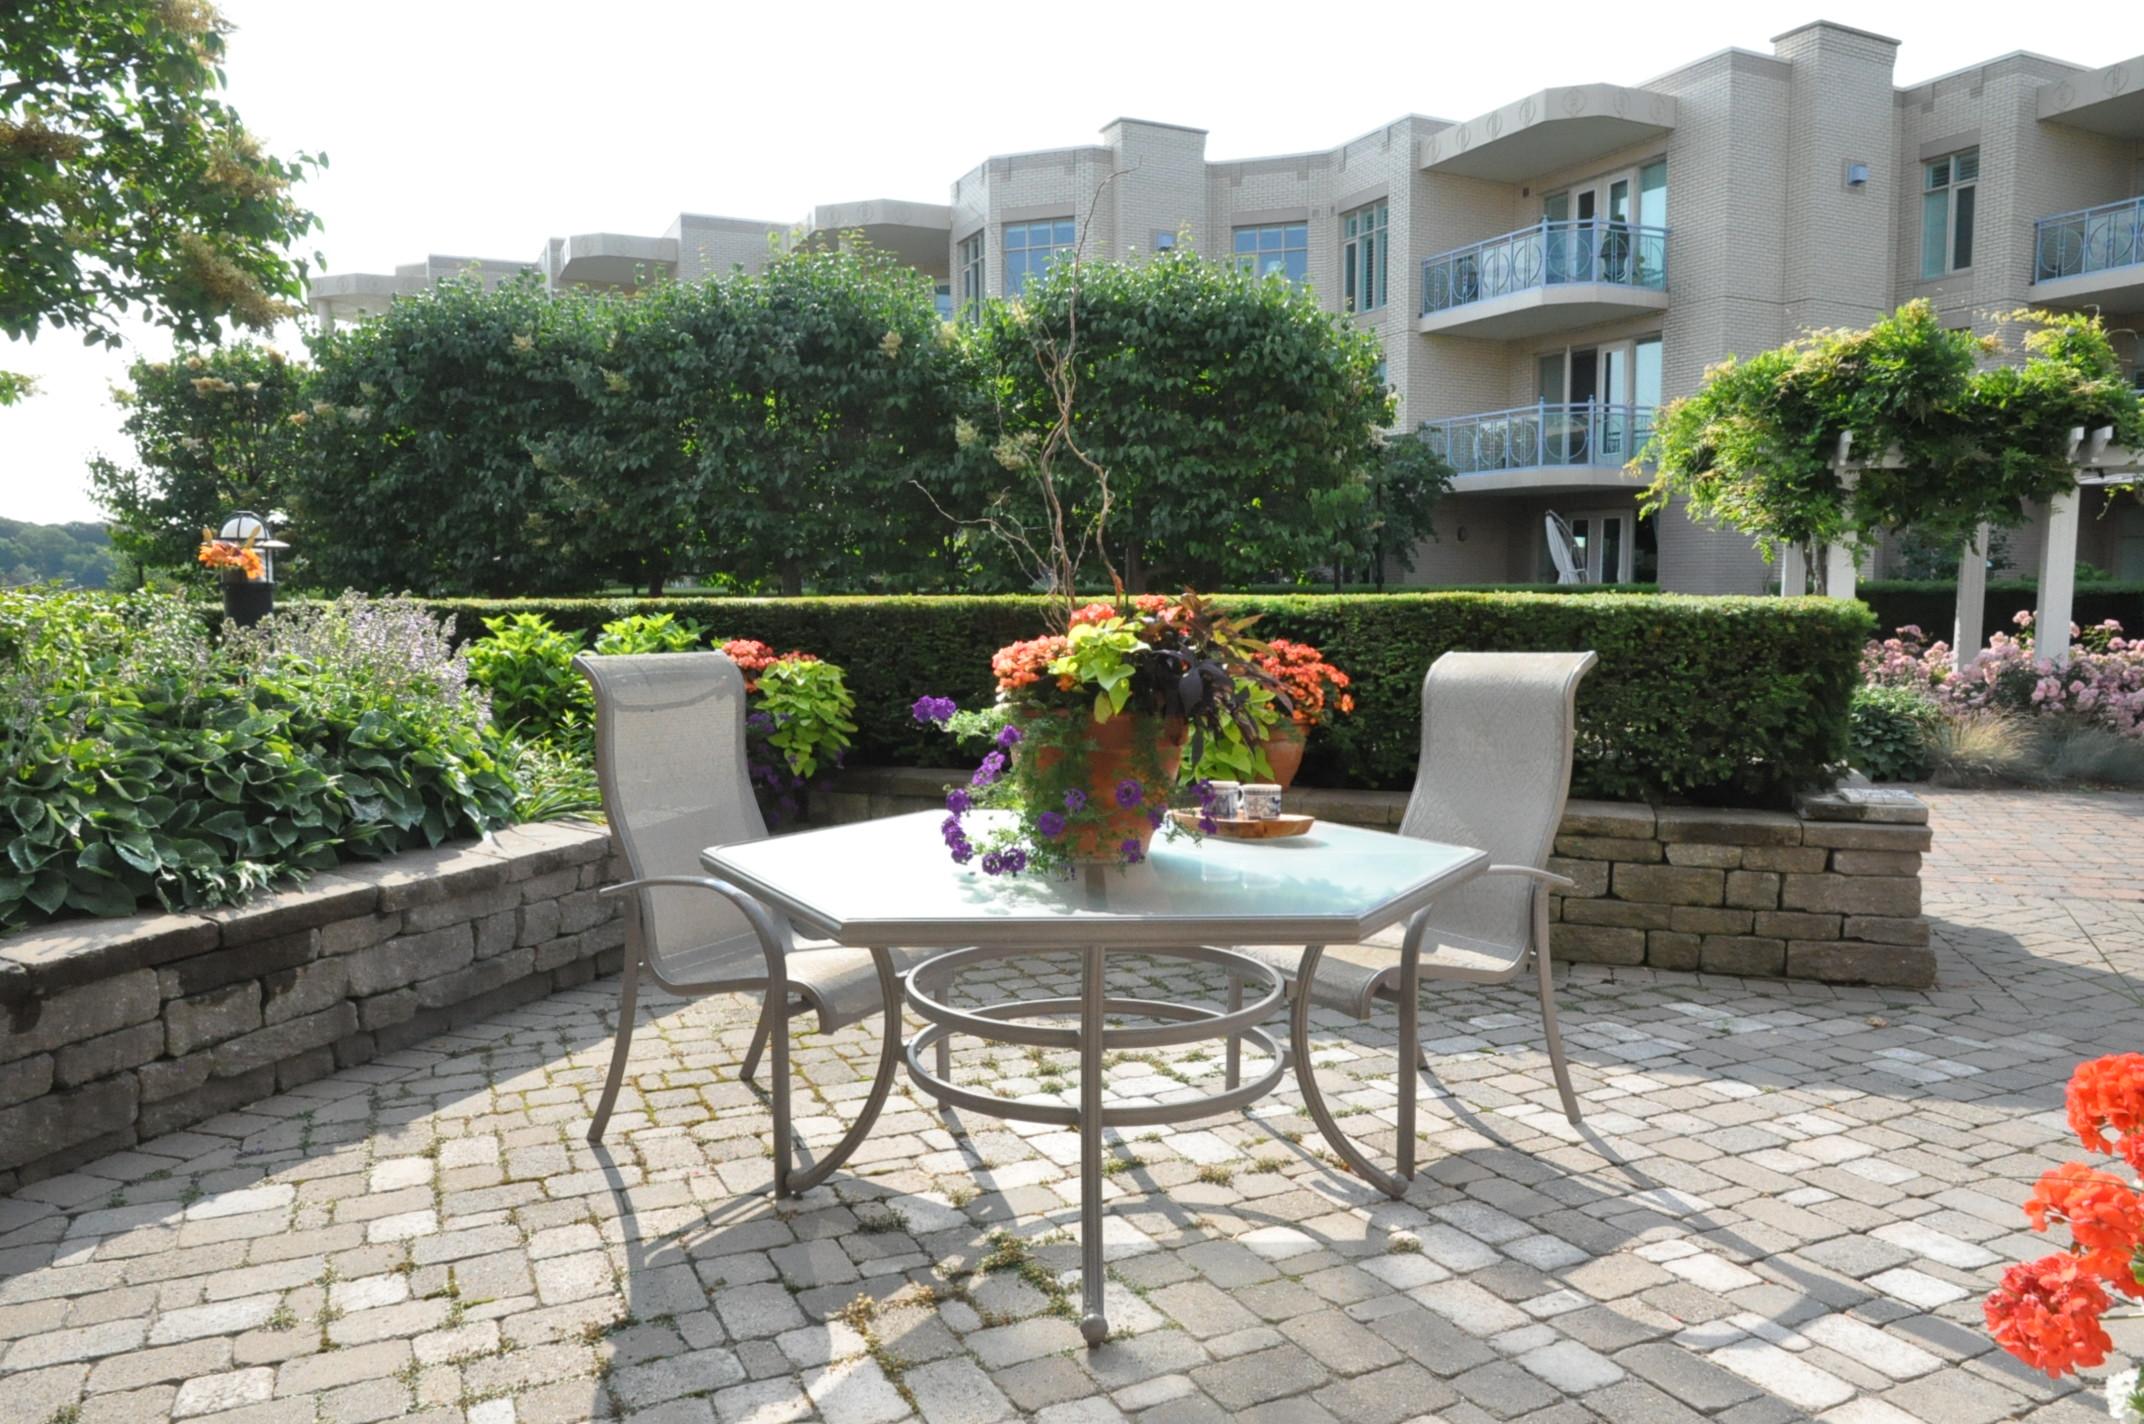 King's Point Condo Garden Suite